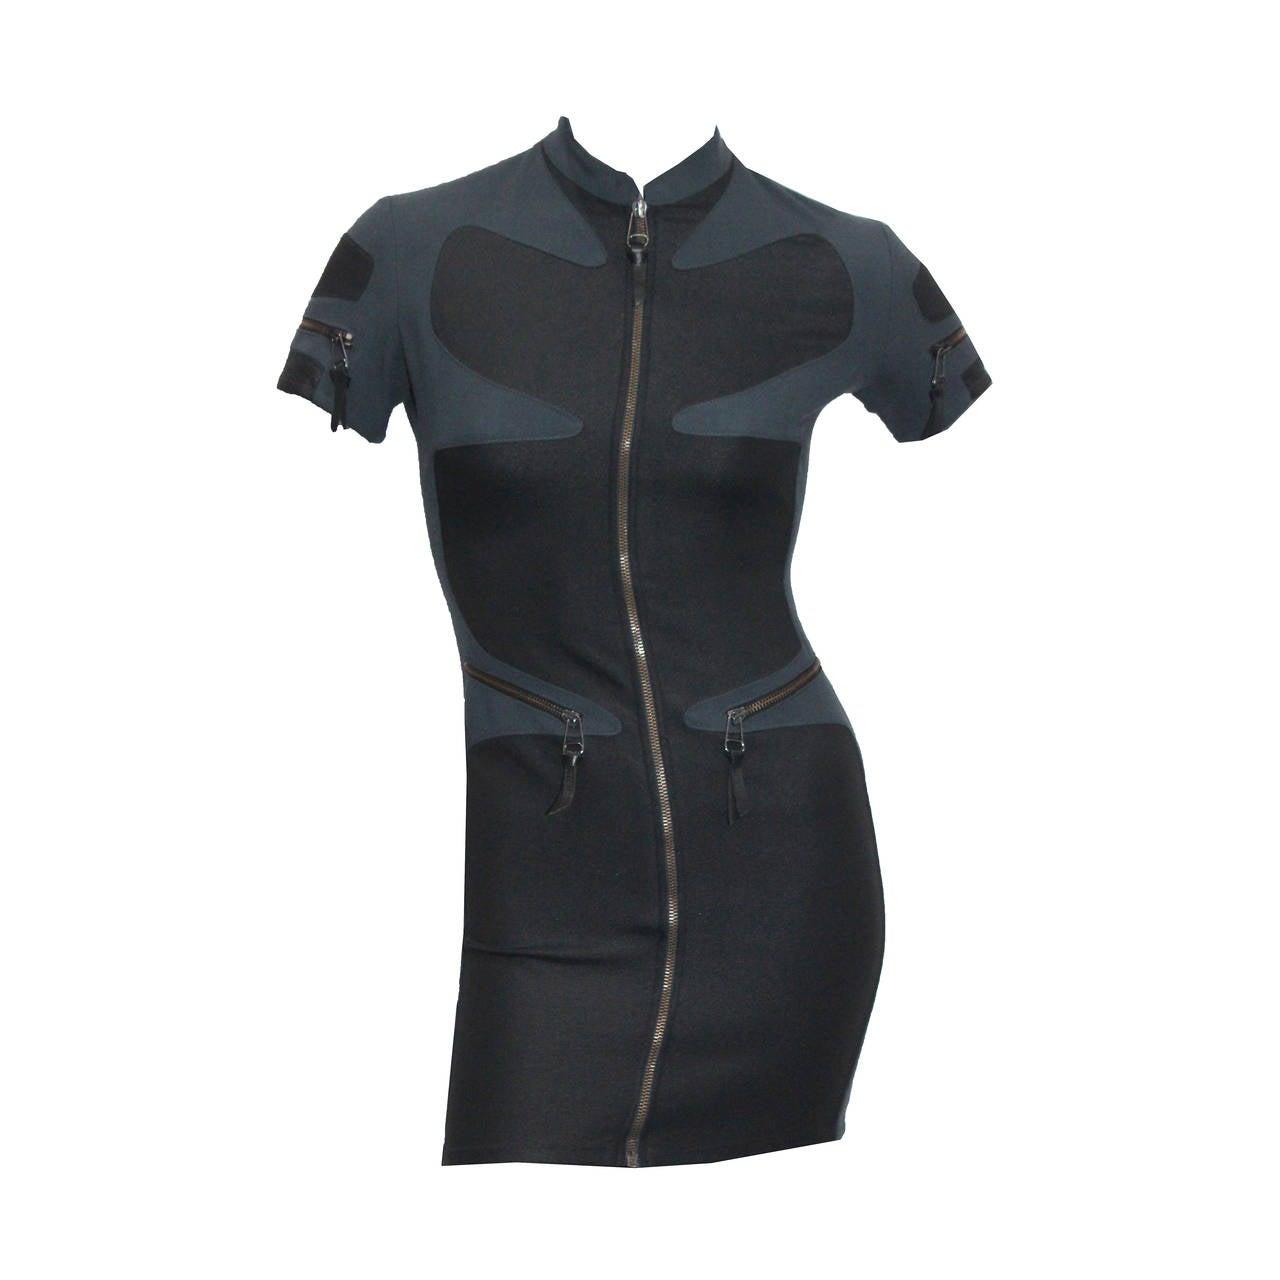 1990s Gianni Versace Versus Body Con Mini Dress 1